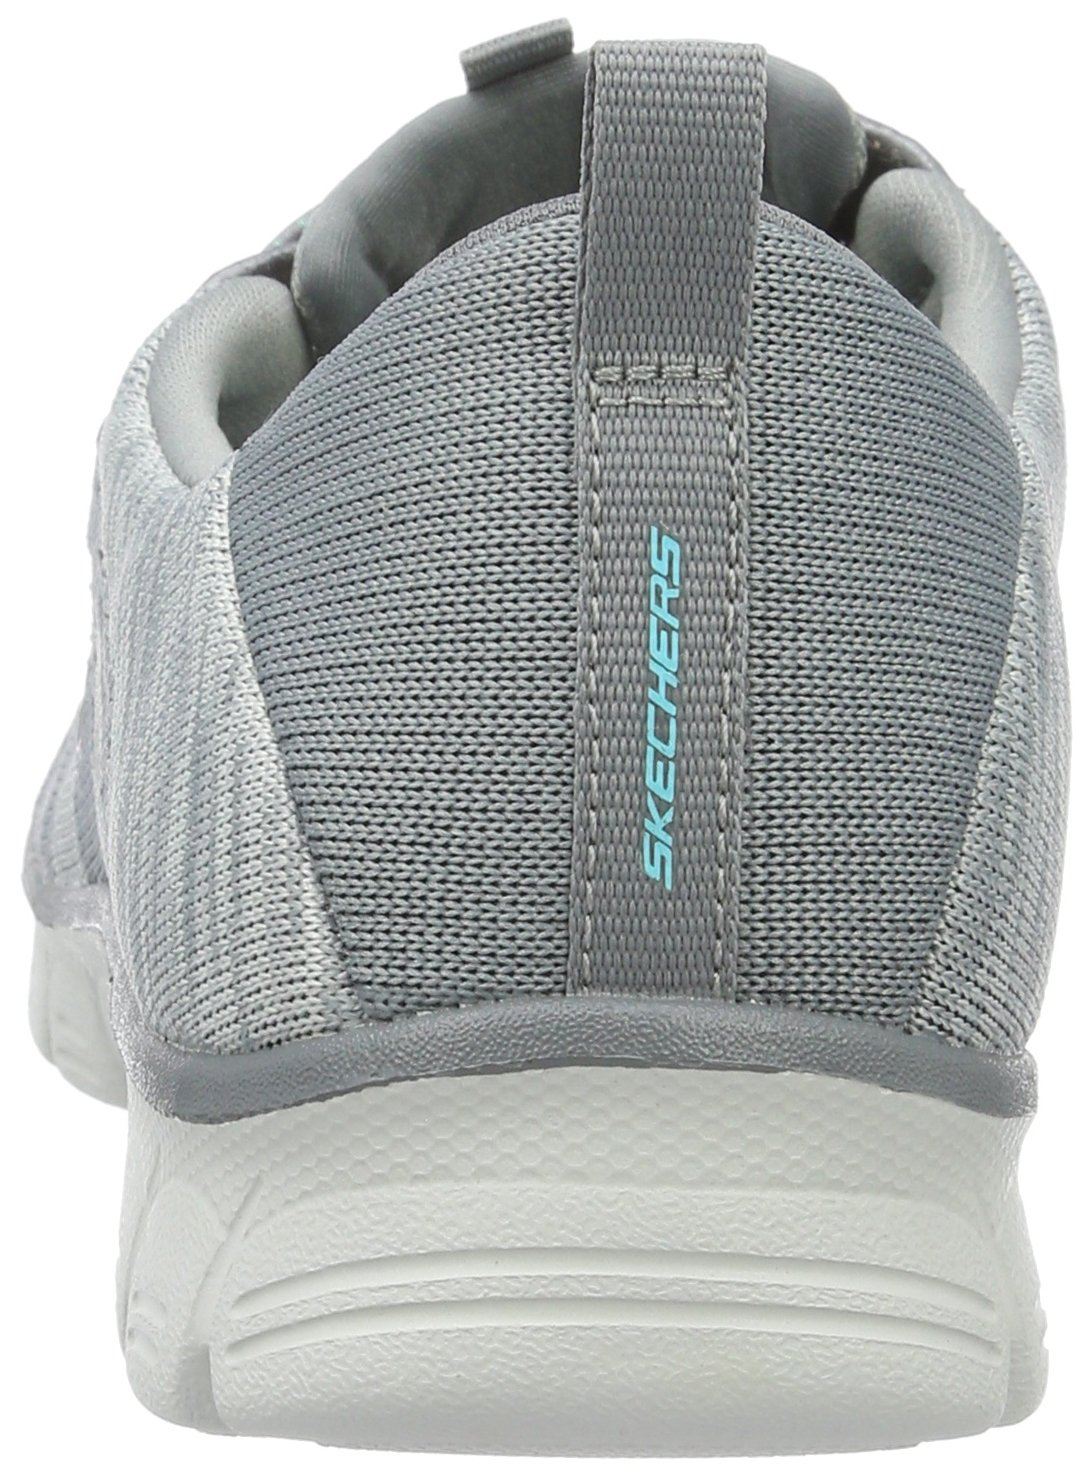 Skechers Women's Sport-Active Ez Flex 3.0 Take-The-Lead Sneaker B01BHRU2XO 10 B(M) US|Gray